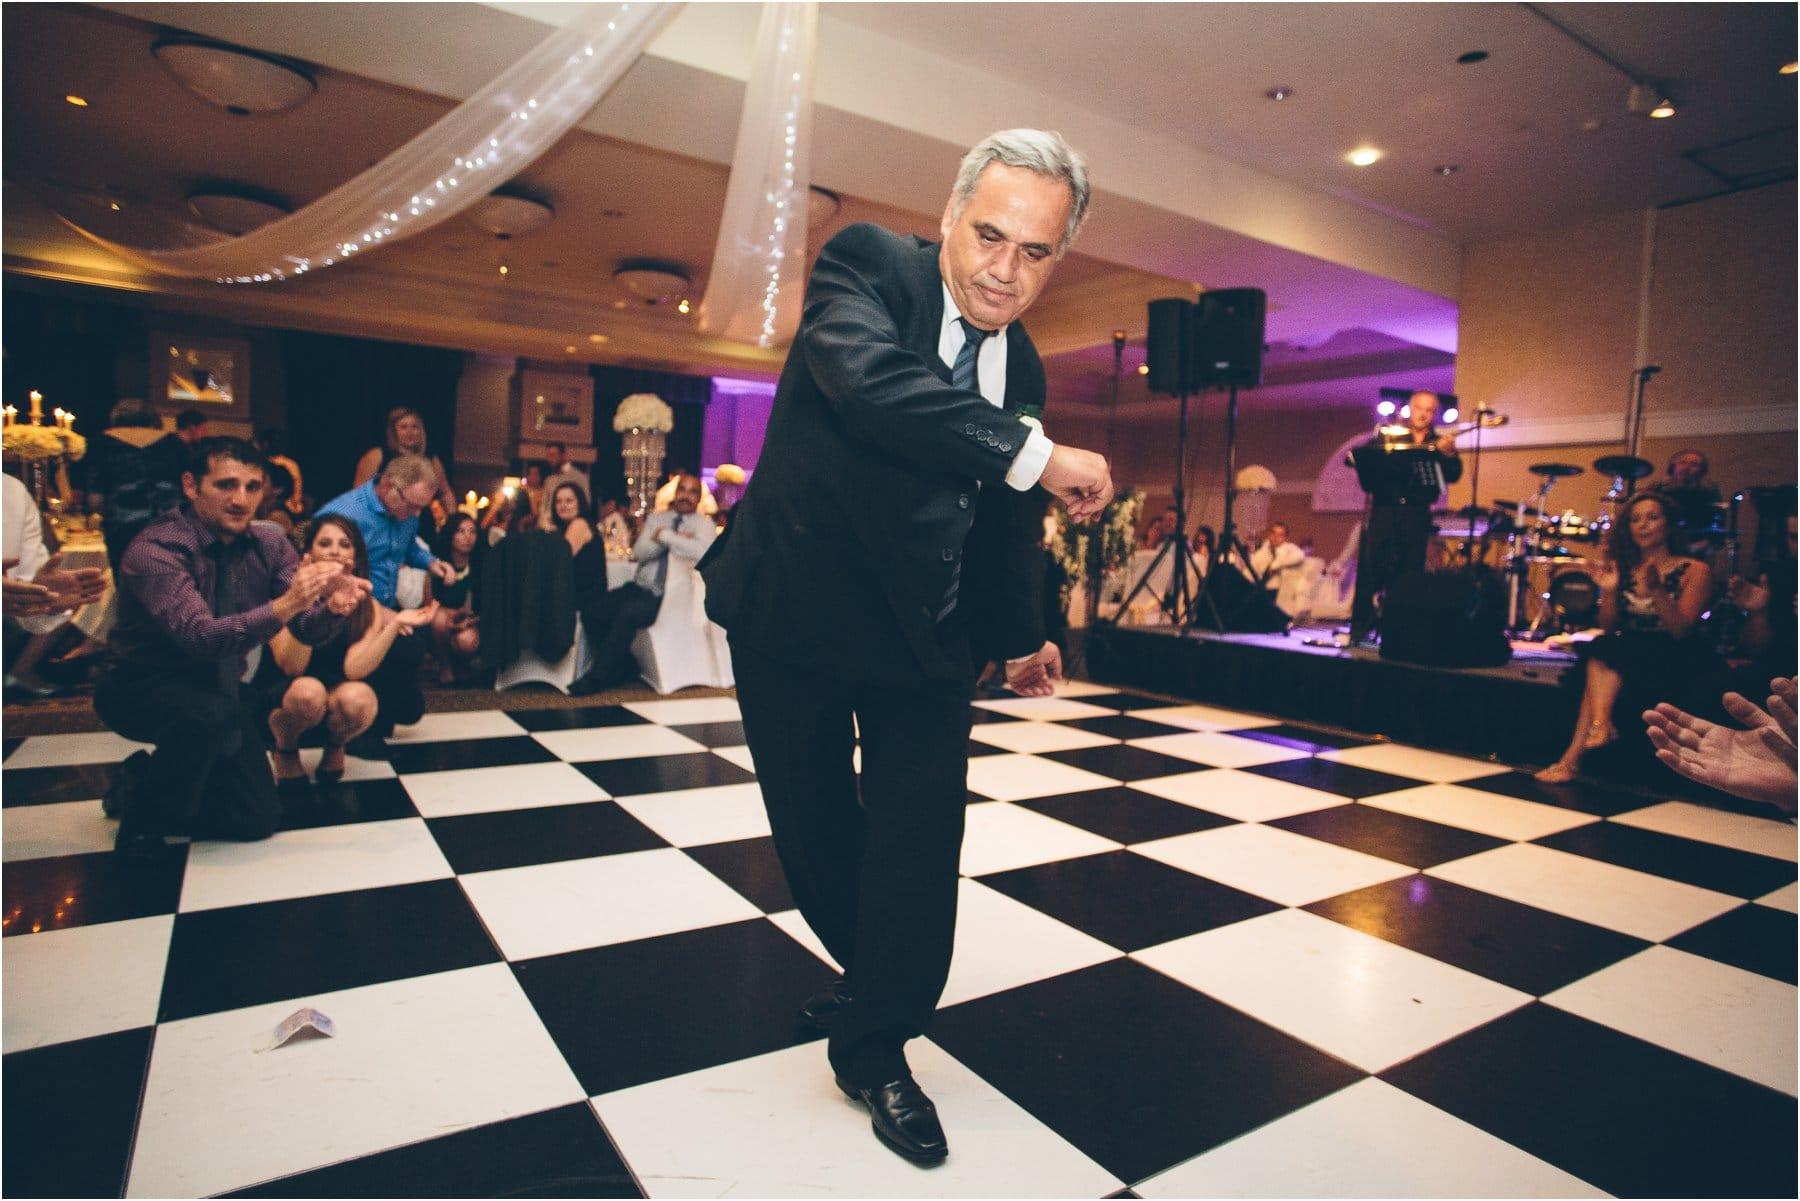 Midland_Manchester_Wedding_Photography_0118